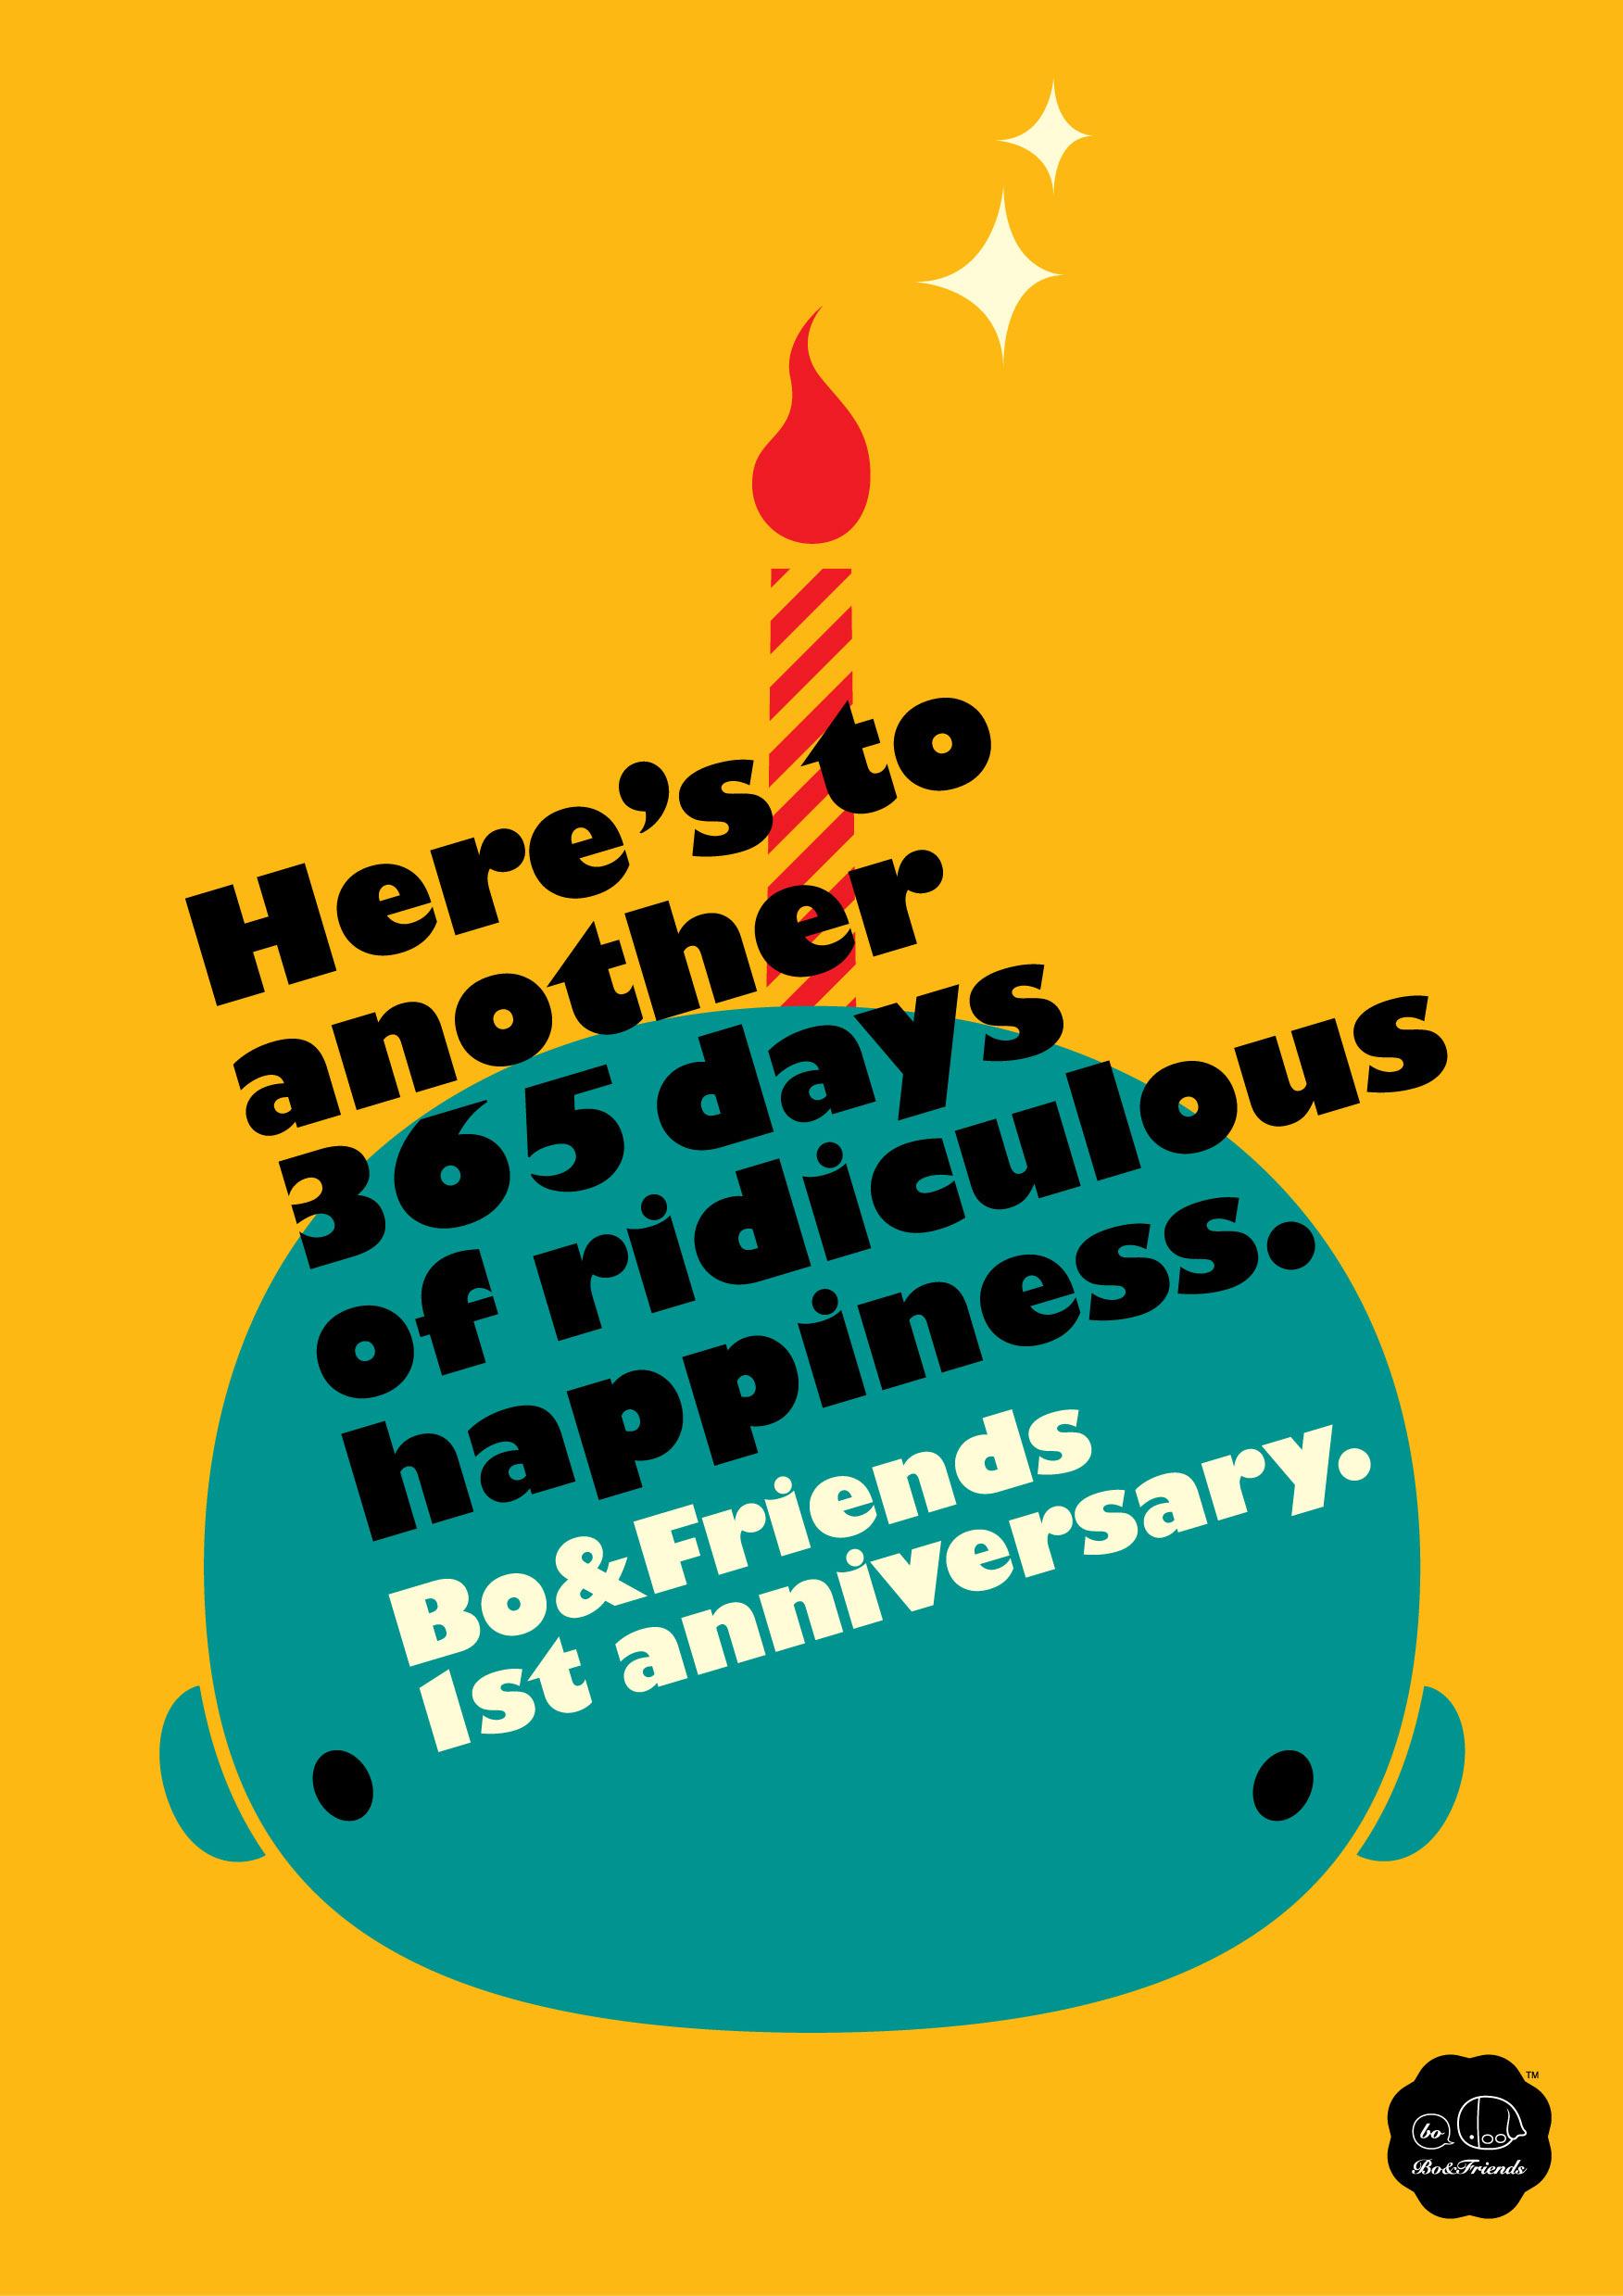 1752x2478 Happy 1st Anniversary, Boampfriends! Kamwei